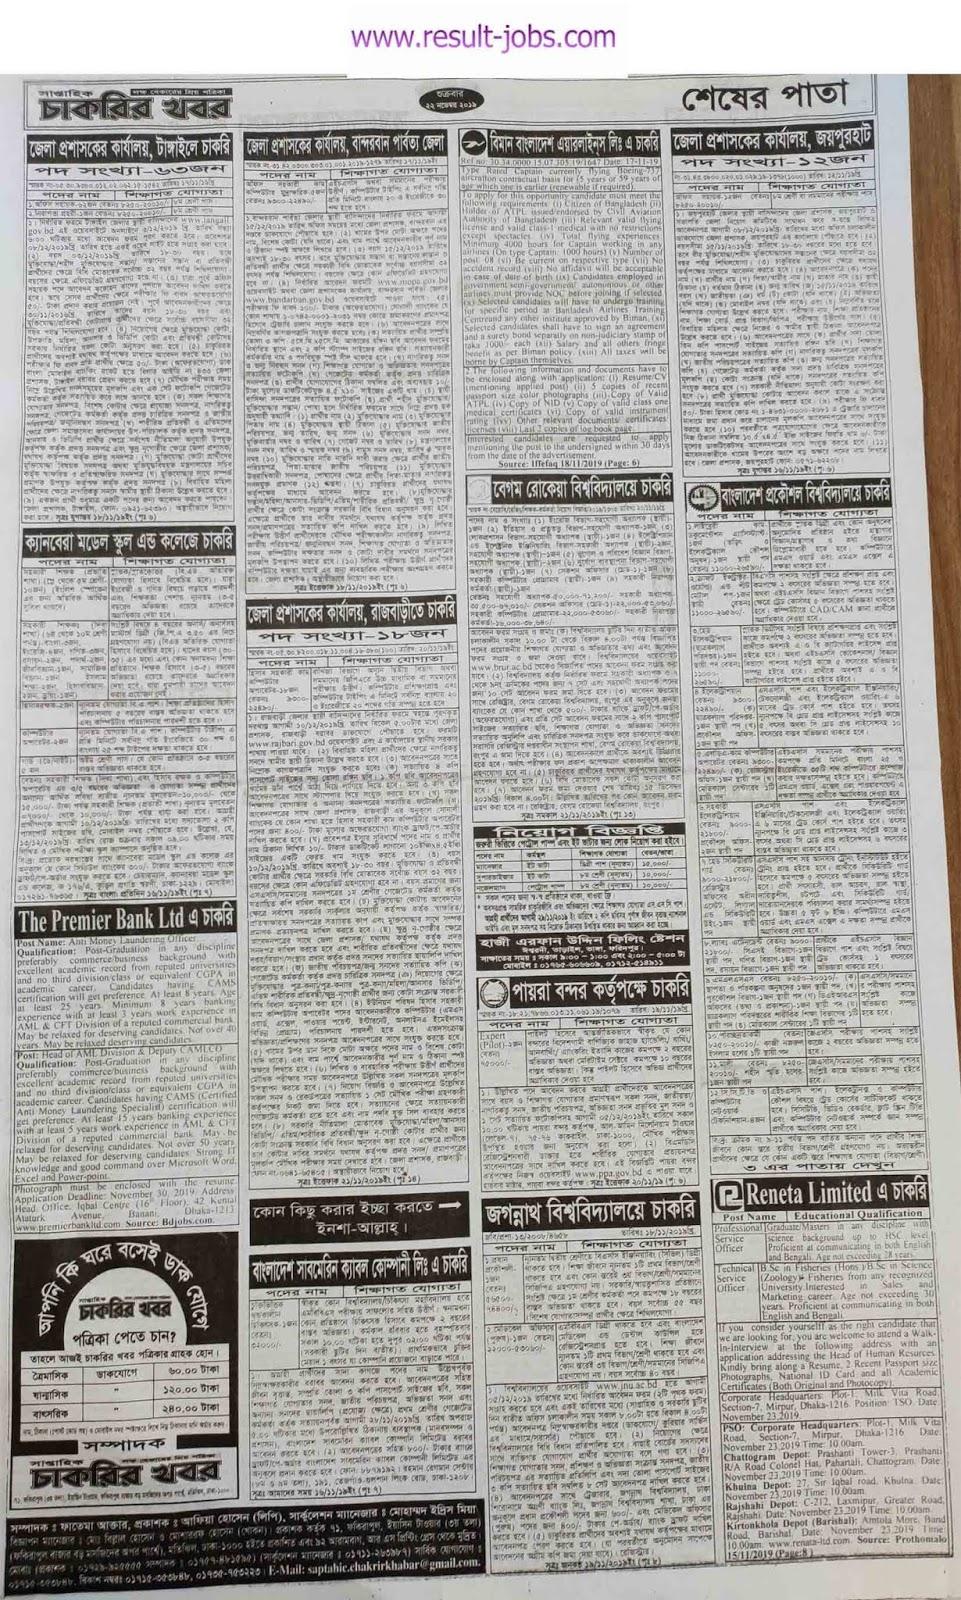 Weekly-chakrir-khobor-bangla-newspaper-www.result-jobs.com1